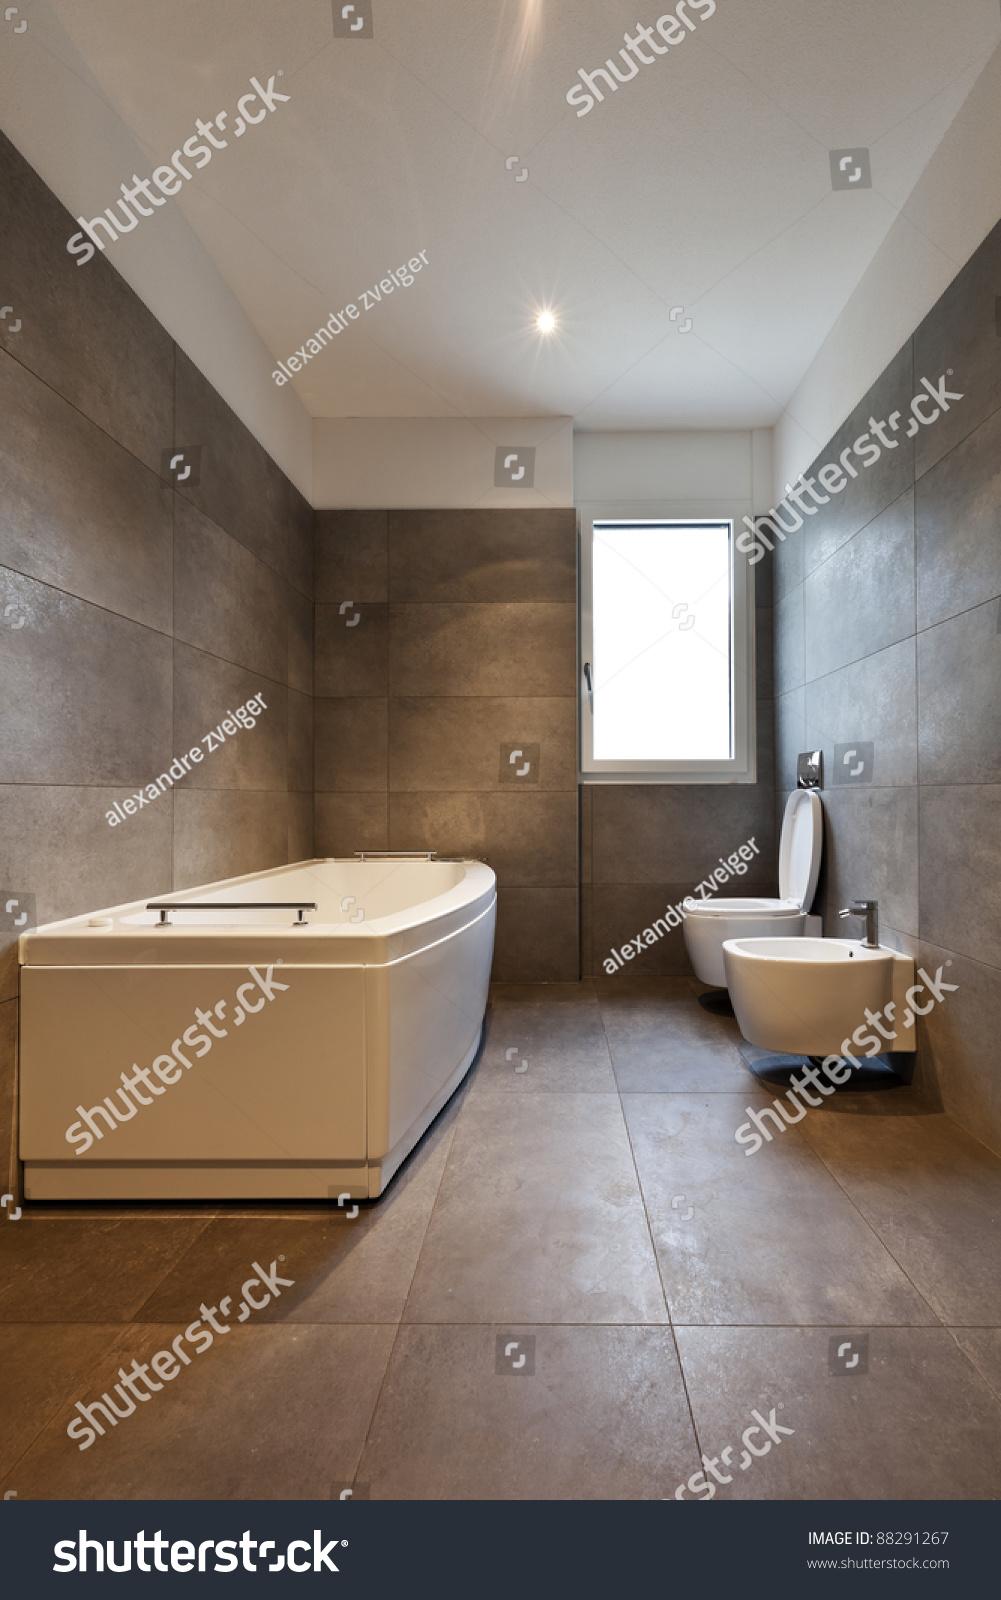 New Apartment Empty Bathroom Stock Photo 88291267  Shutterstock